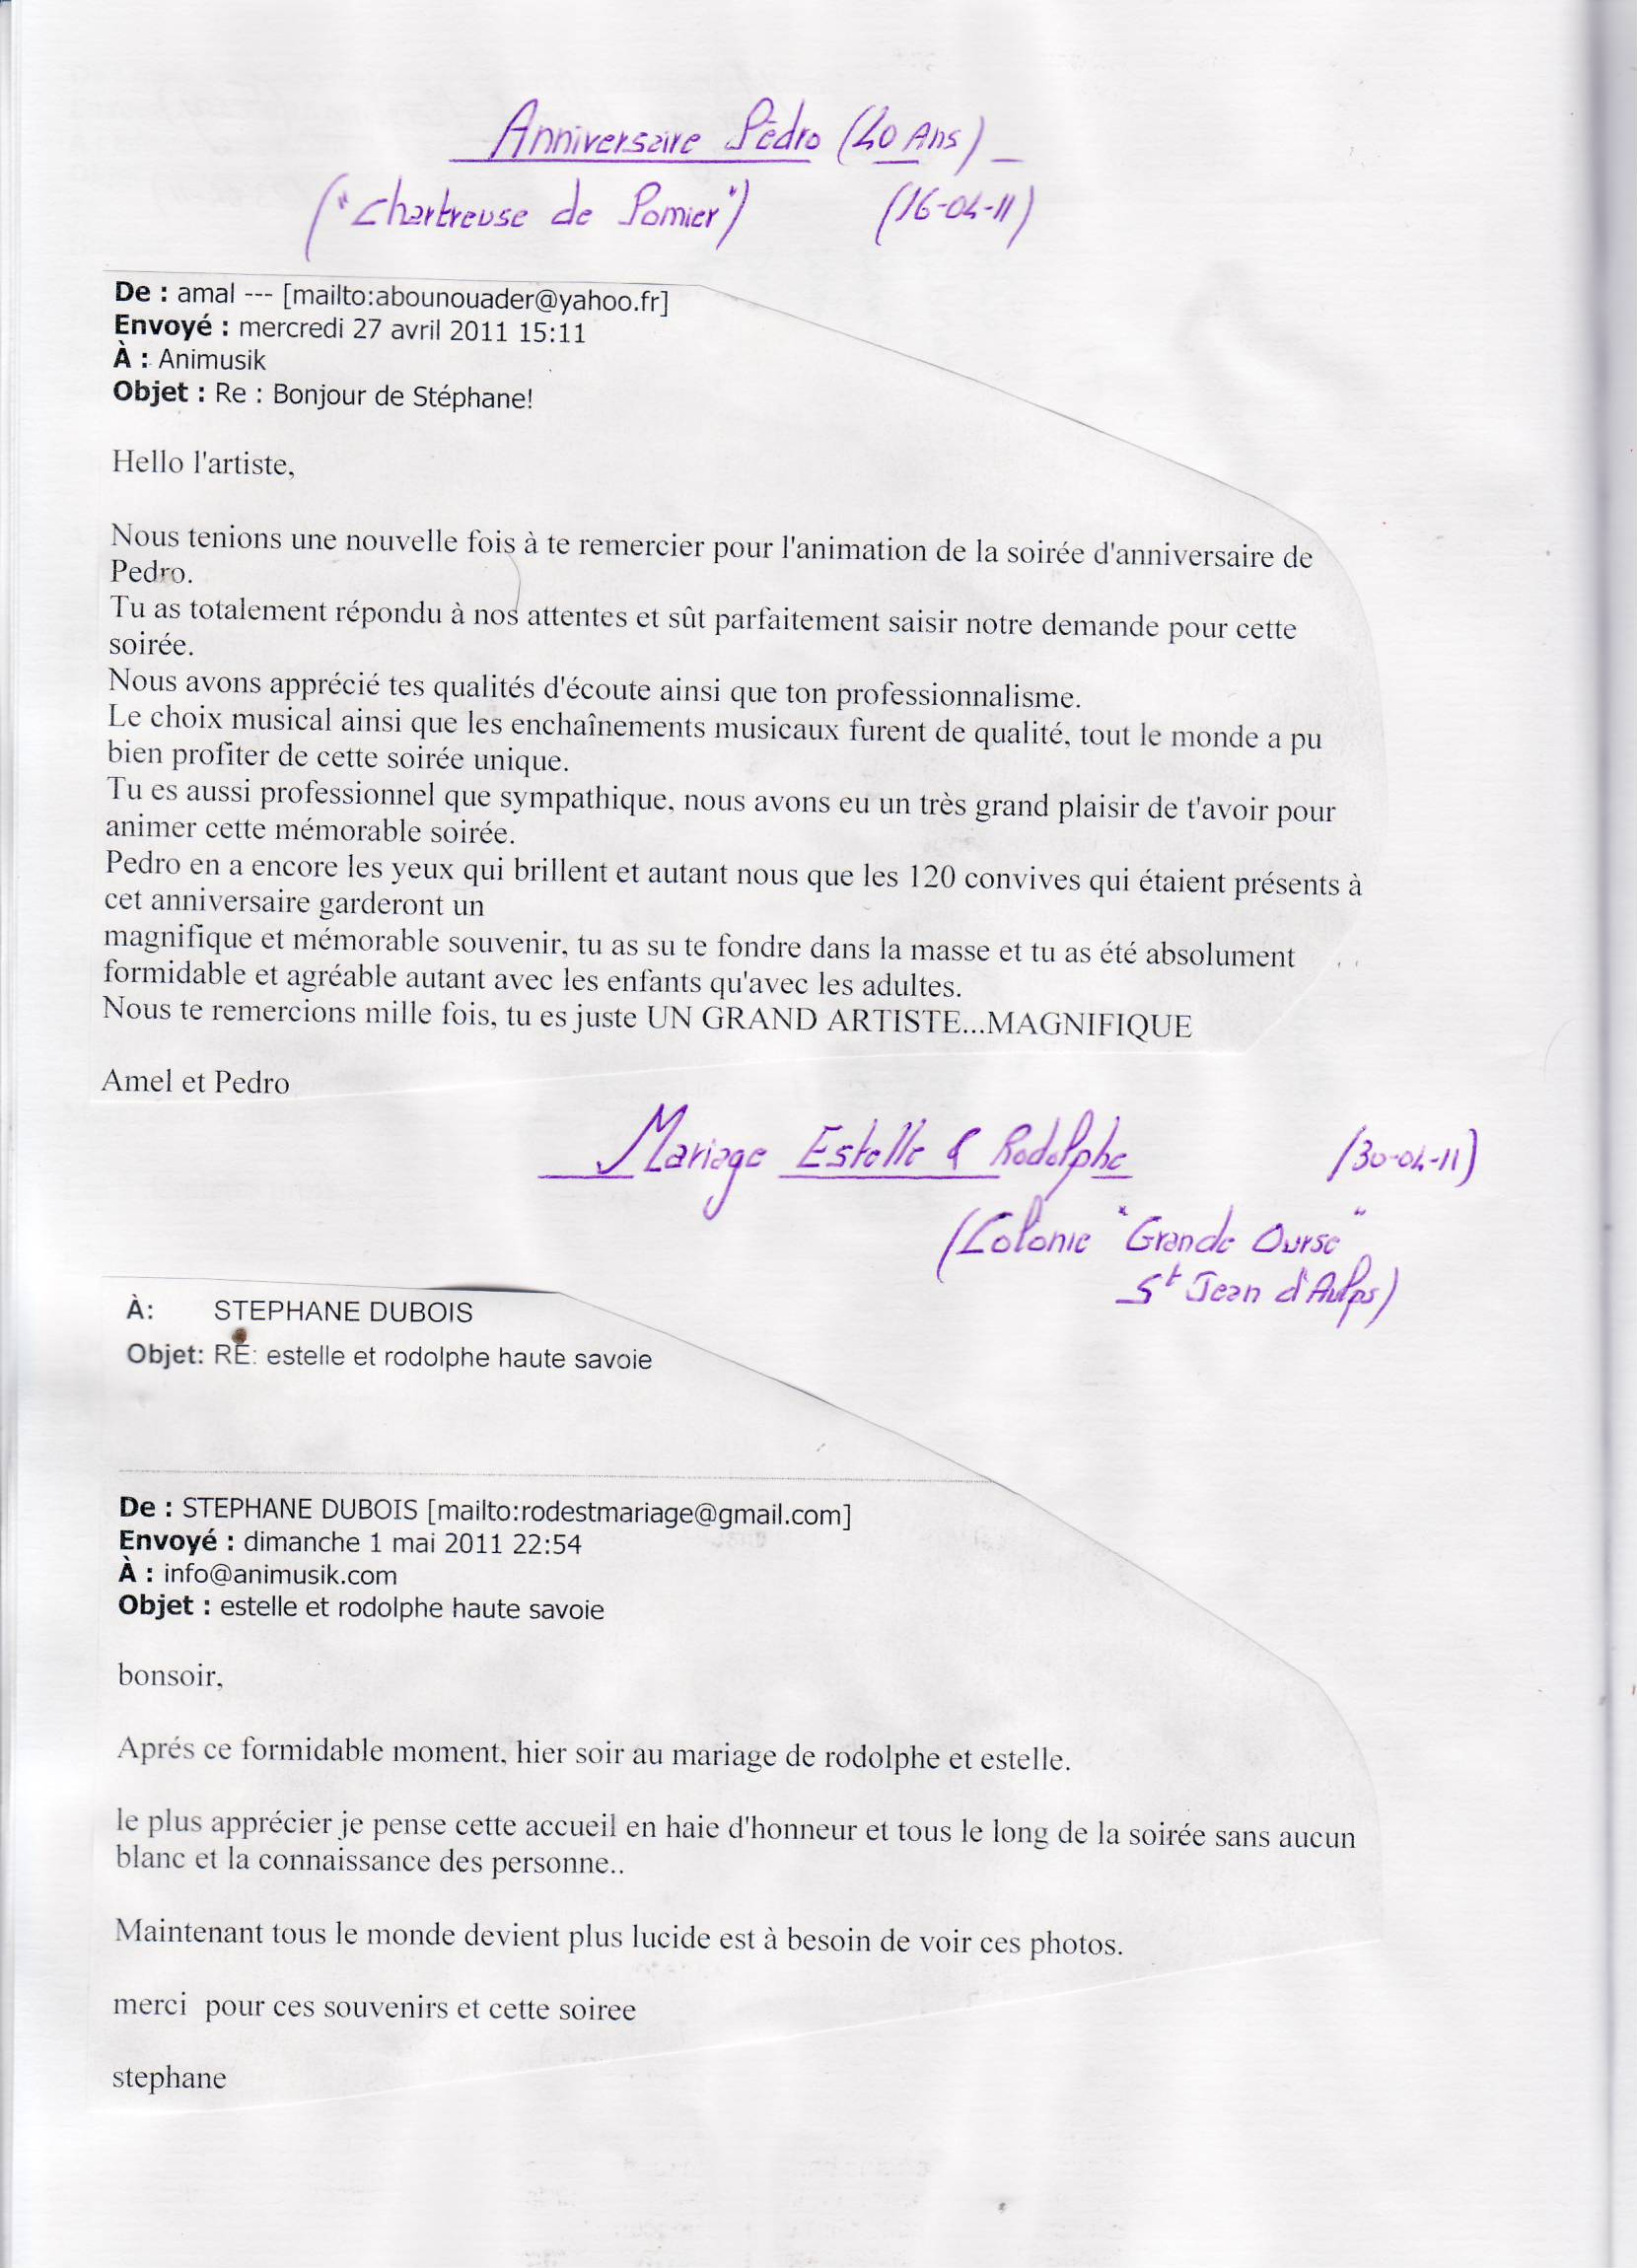 Mail0165.JPG